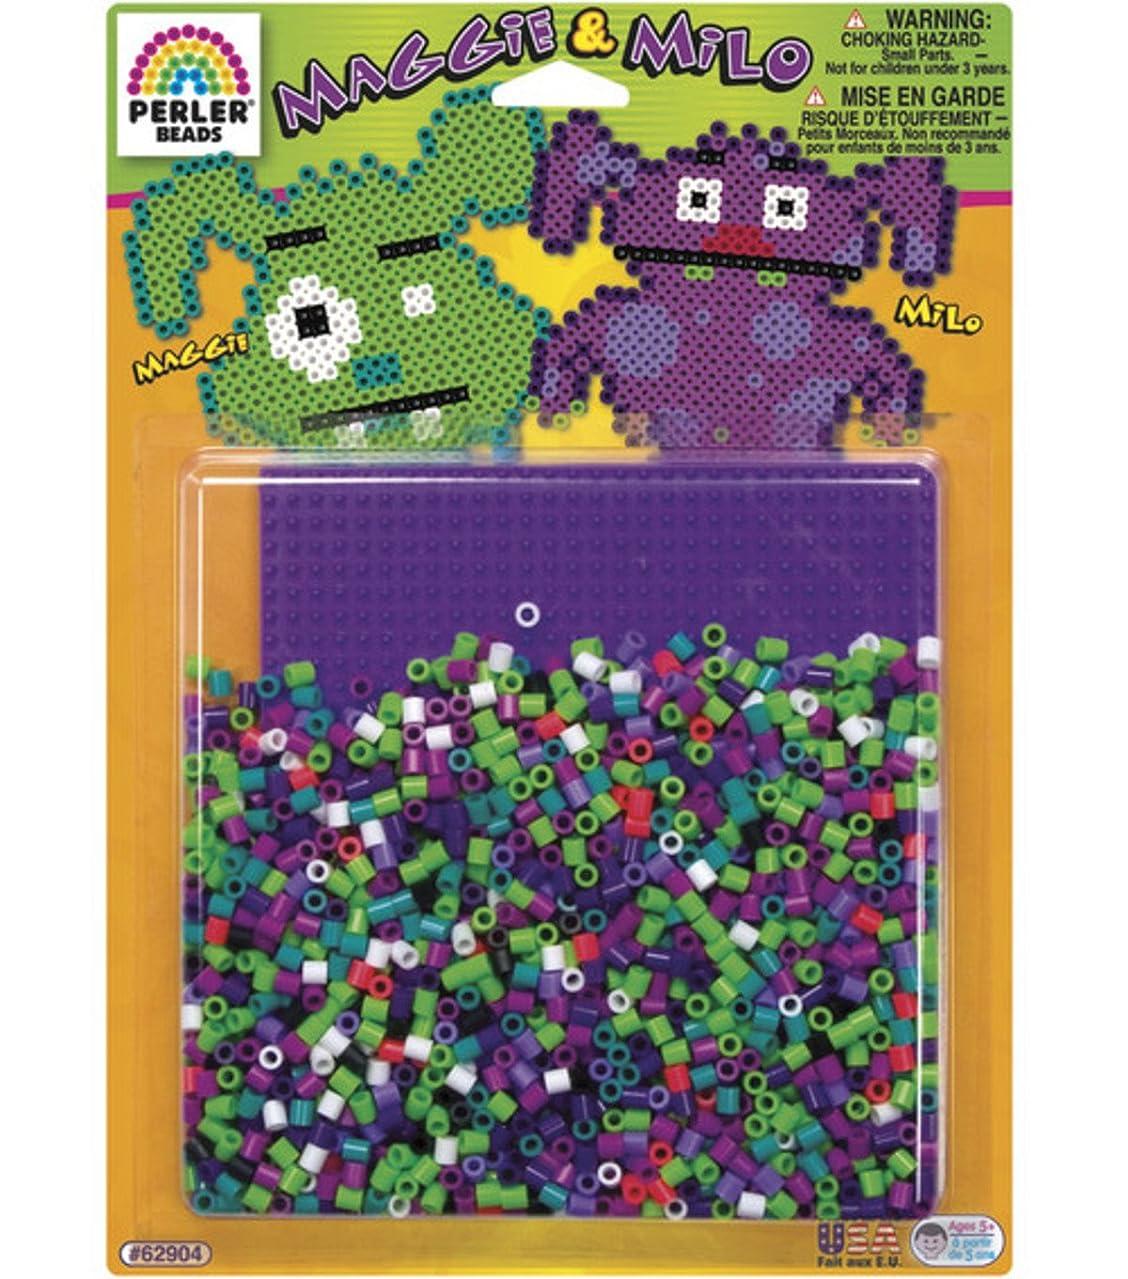 Perler Beads Fuse Bead Activity Kit: Maggie & Milo